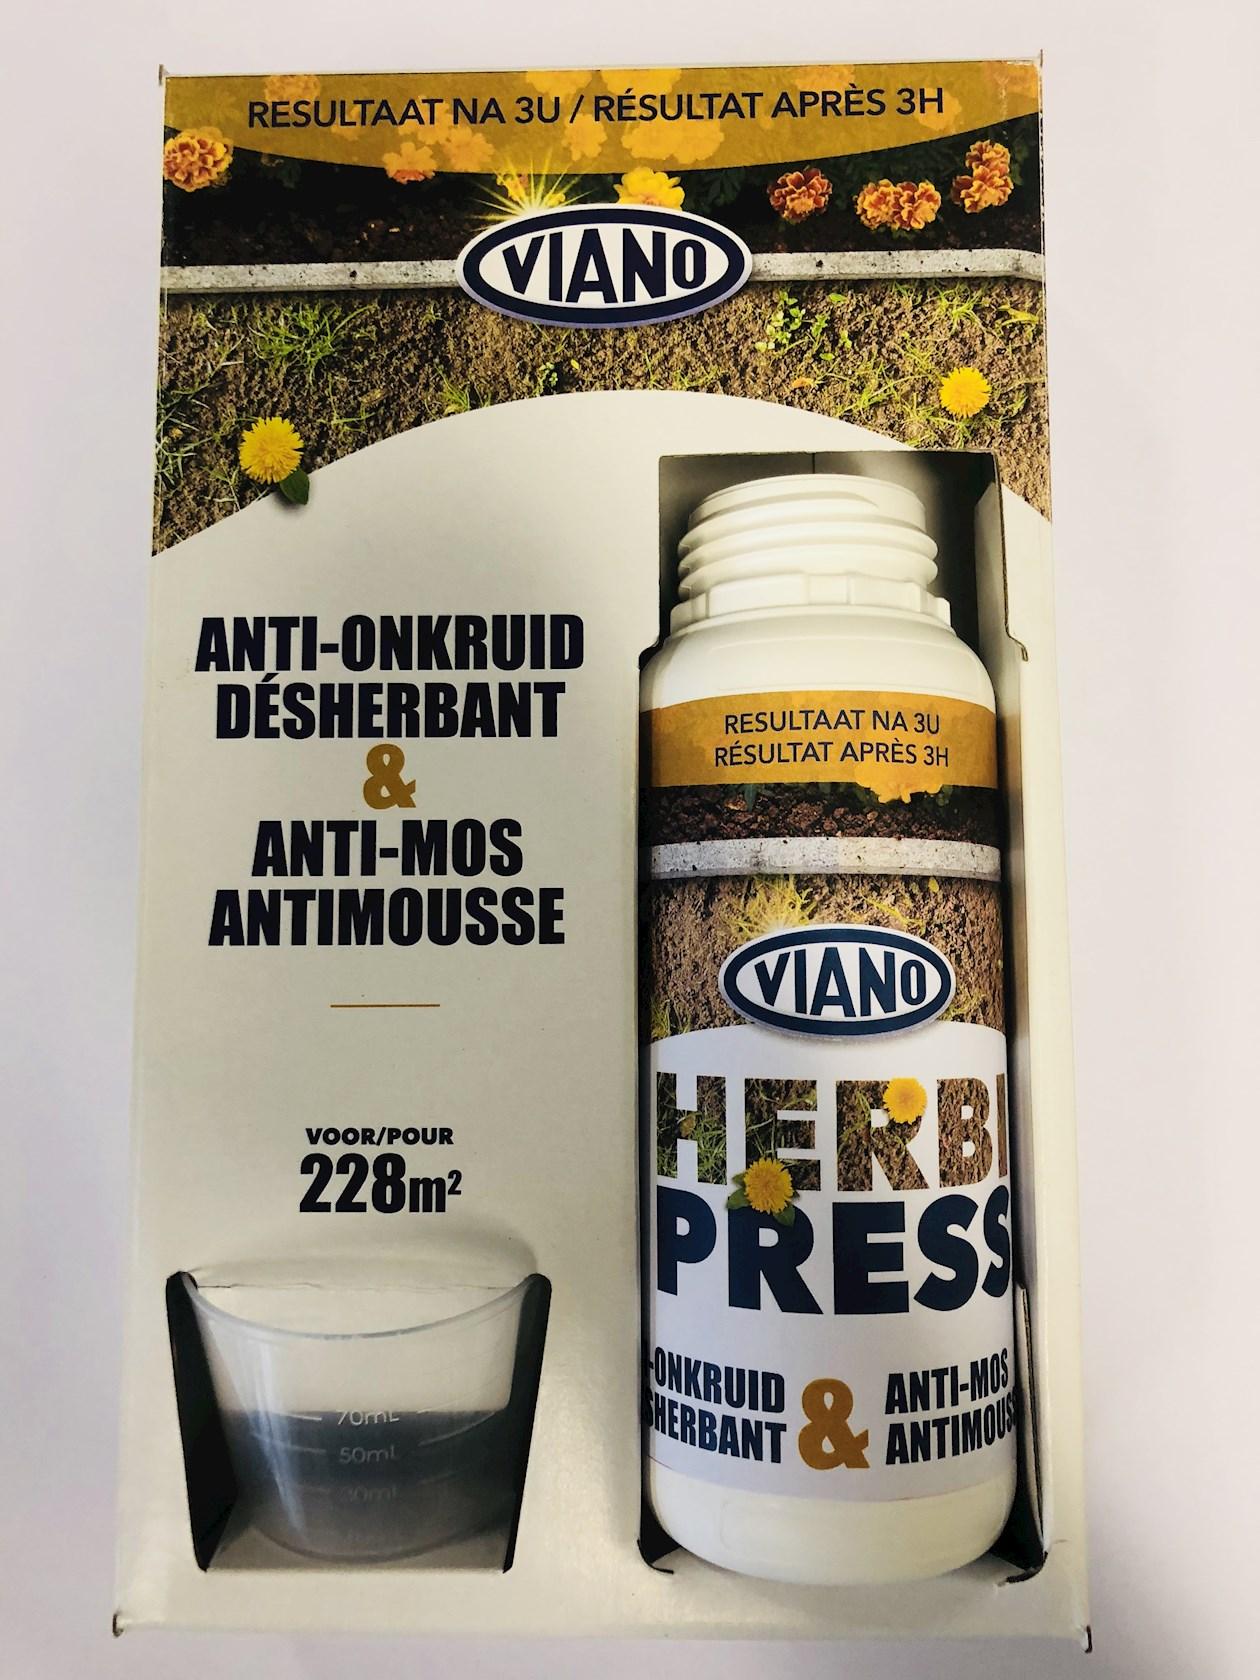 Herbi-press-0-5L-tegen-onkruid-en-mos